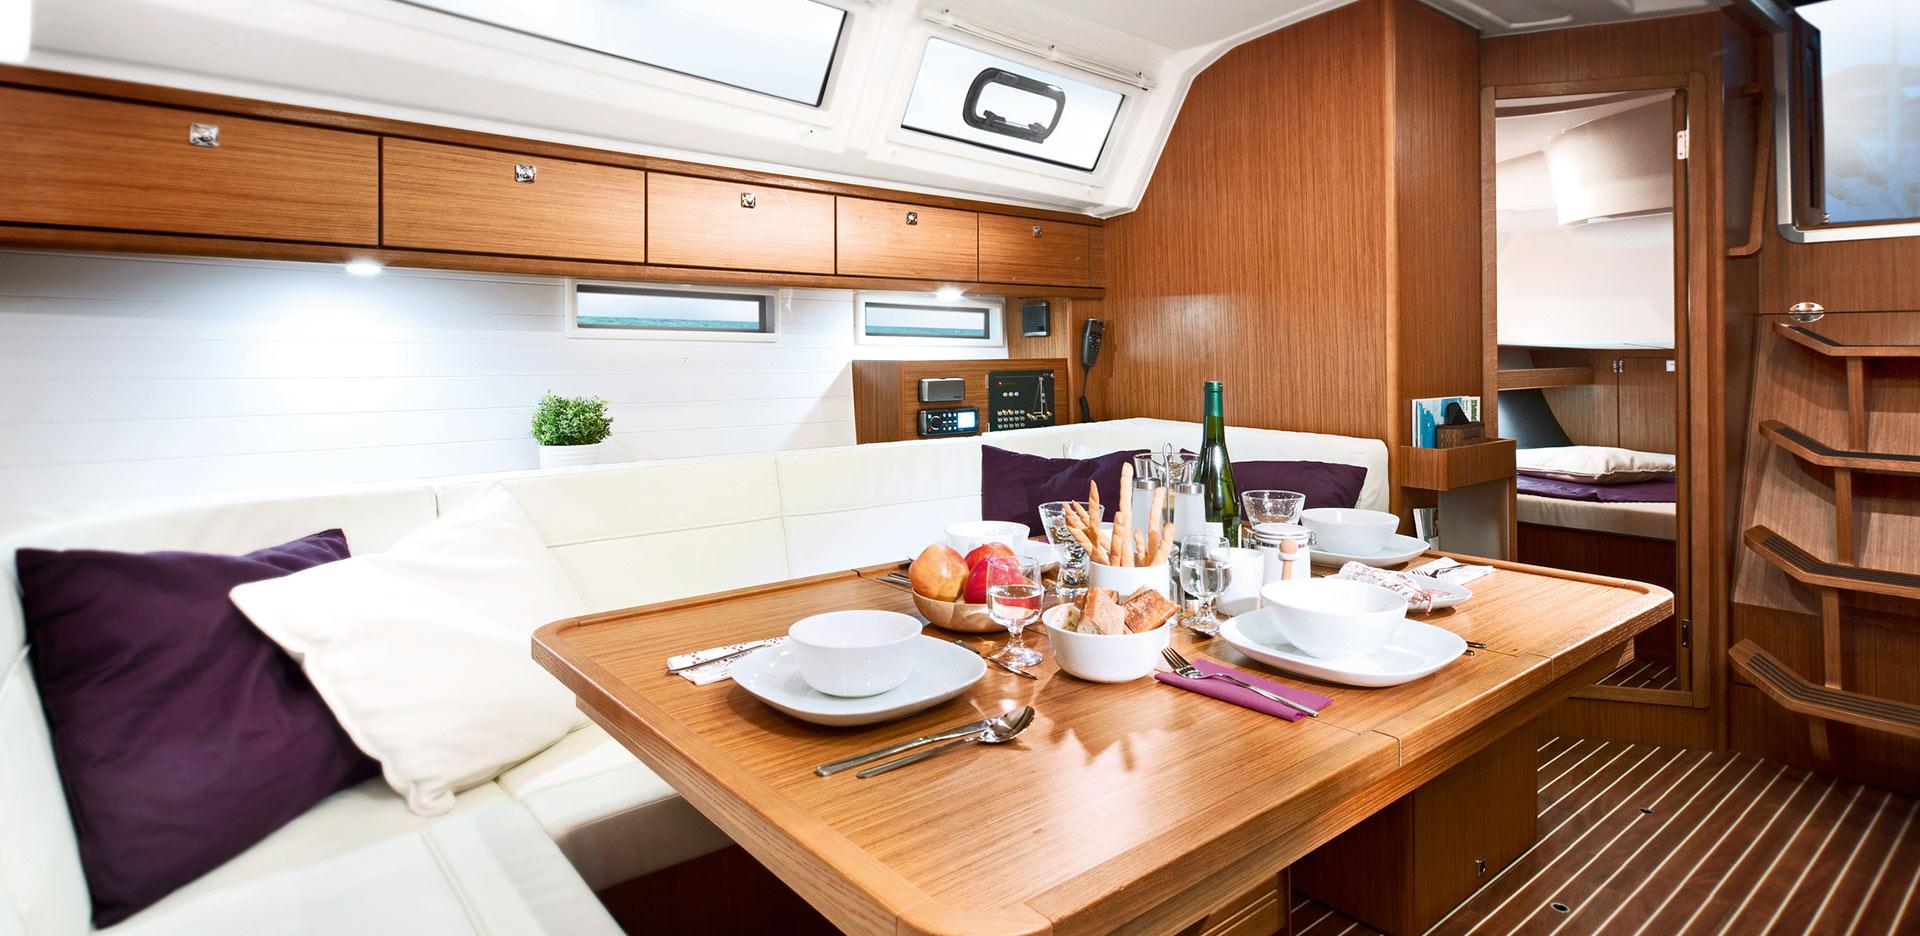 Livig-room-Inchiriere-Petreceri-Croaziere-Vacante-Yacht-Bavaria-Cruise46_2